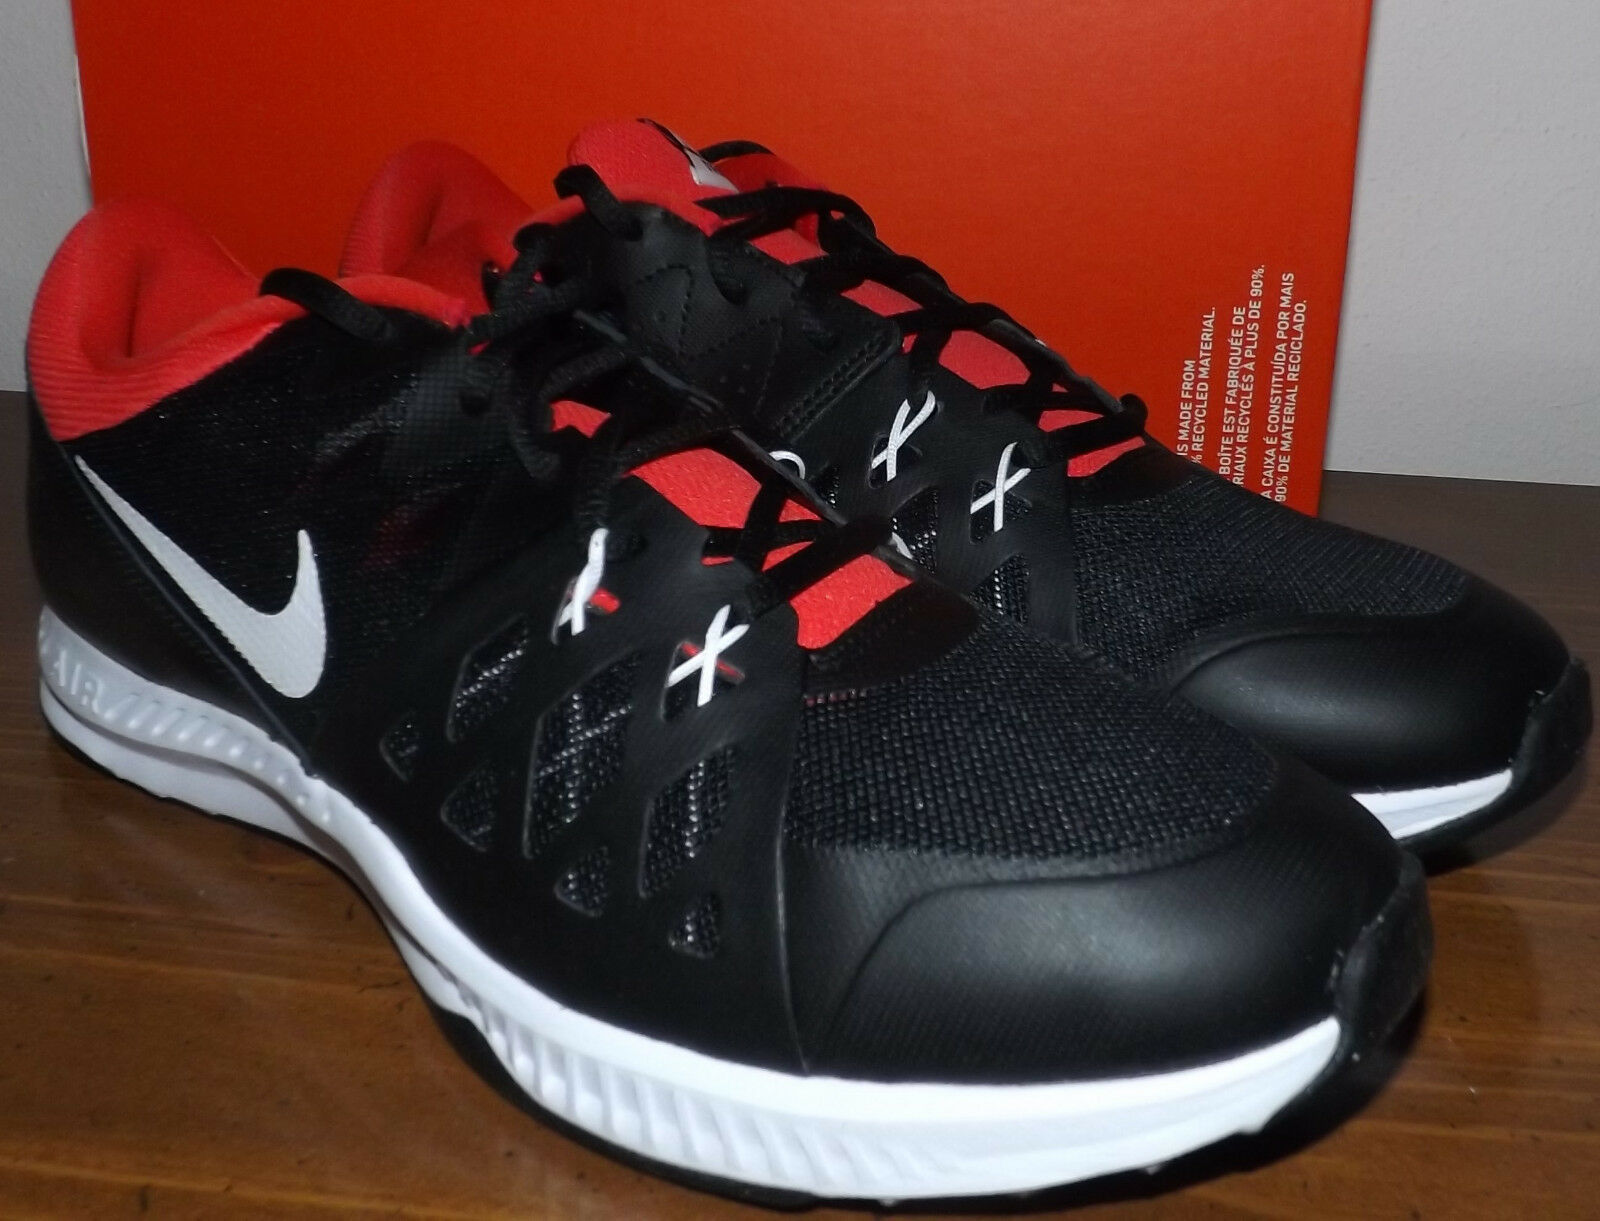 NIKE AIR EPIC SPEED TR Negro Rojo Talla Talla Talla 11 para hombres II nuevo zapatos para correr 8d9897